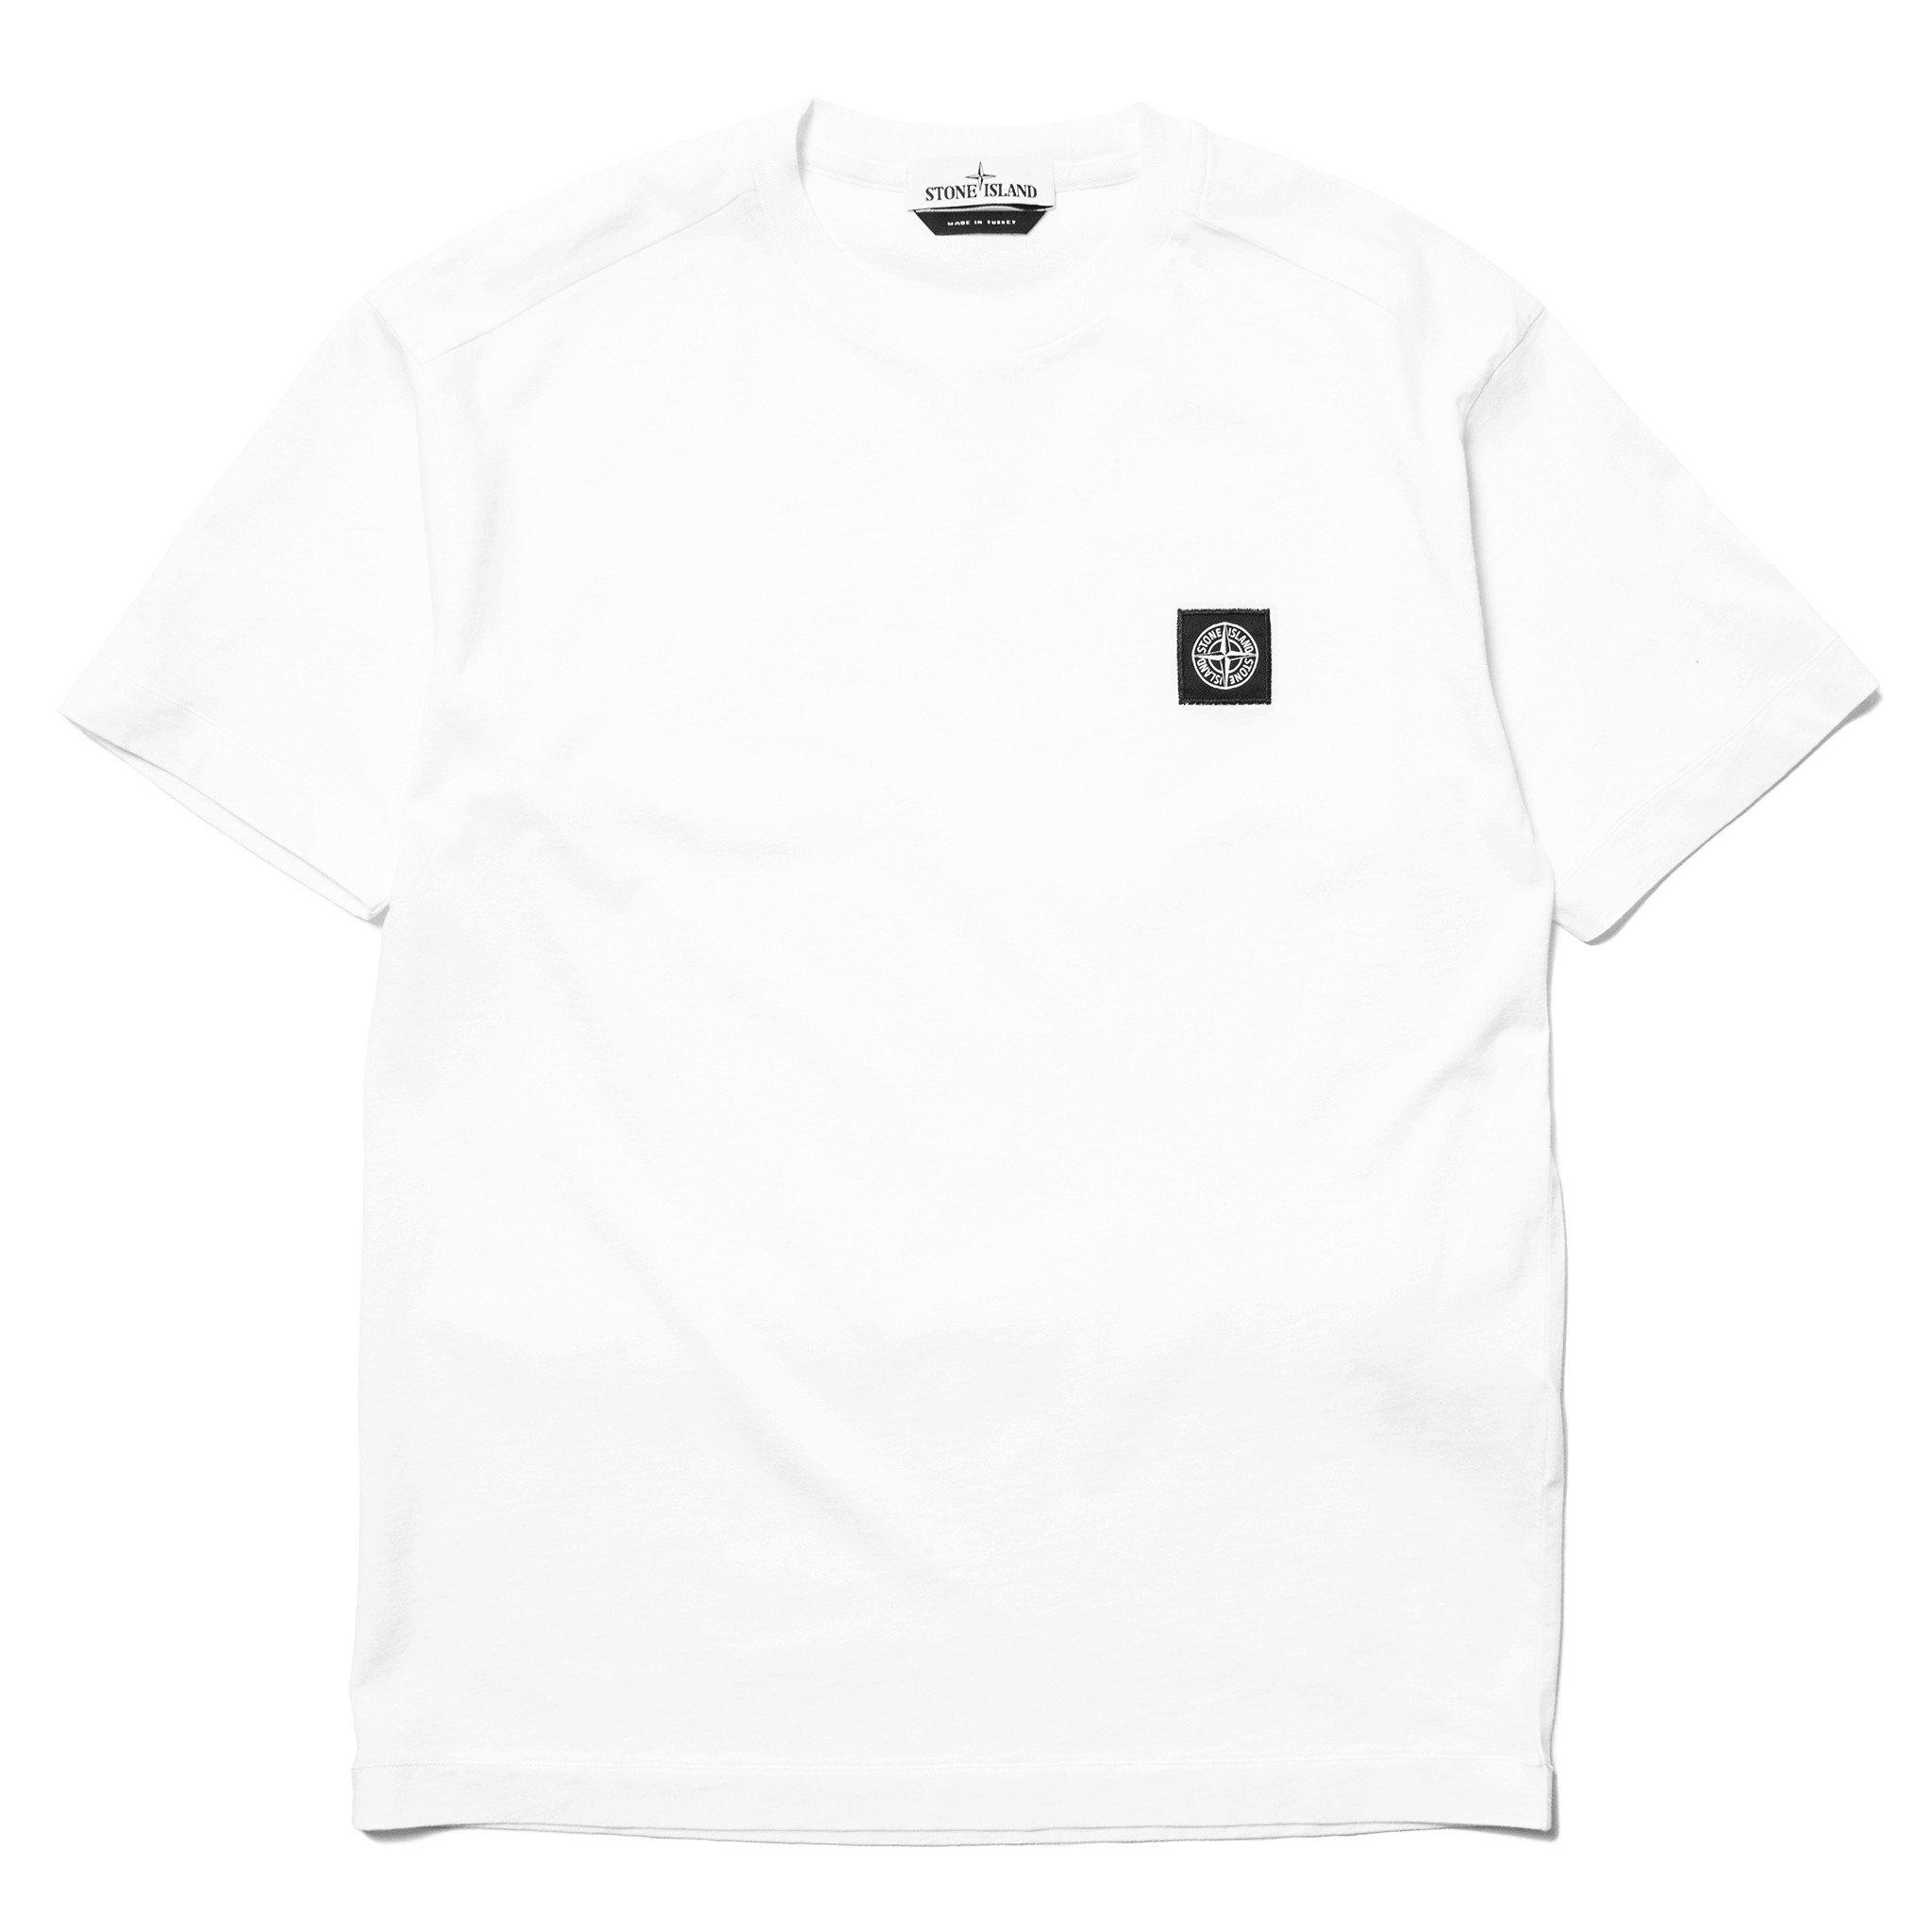 Stone-Island-Jersey-Cotton-Garment-Dyed-Badge-T-Shirt-WHITE-1_2048x2048